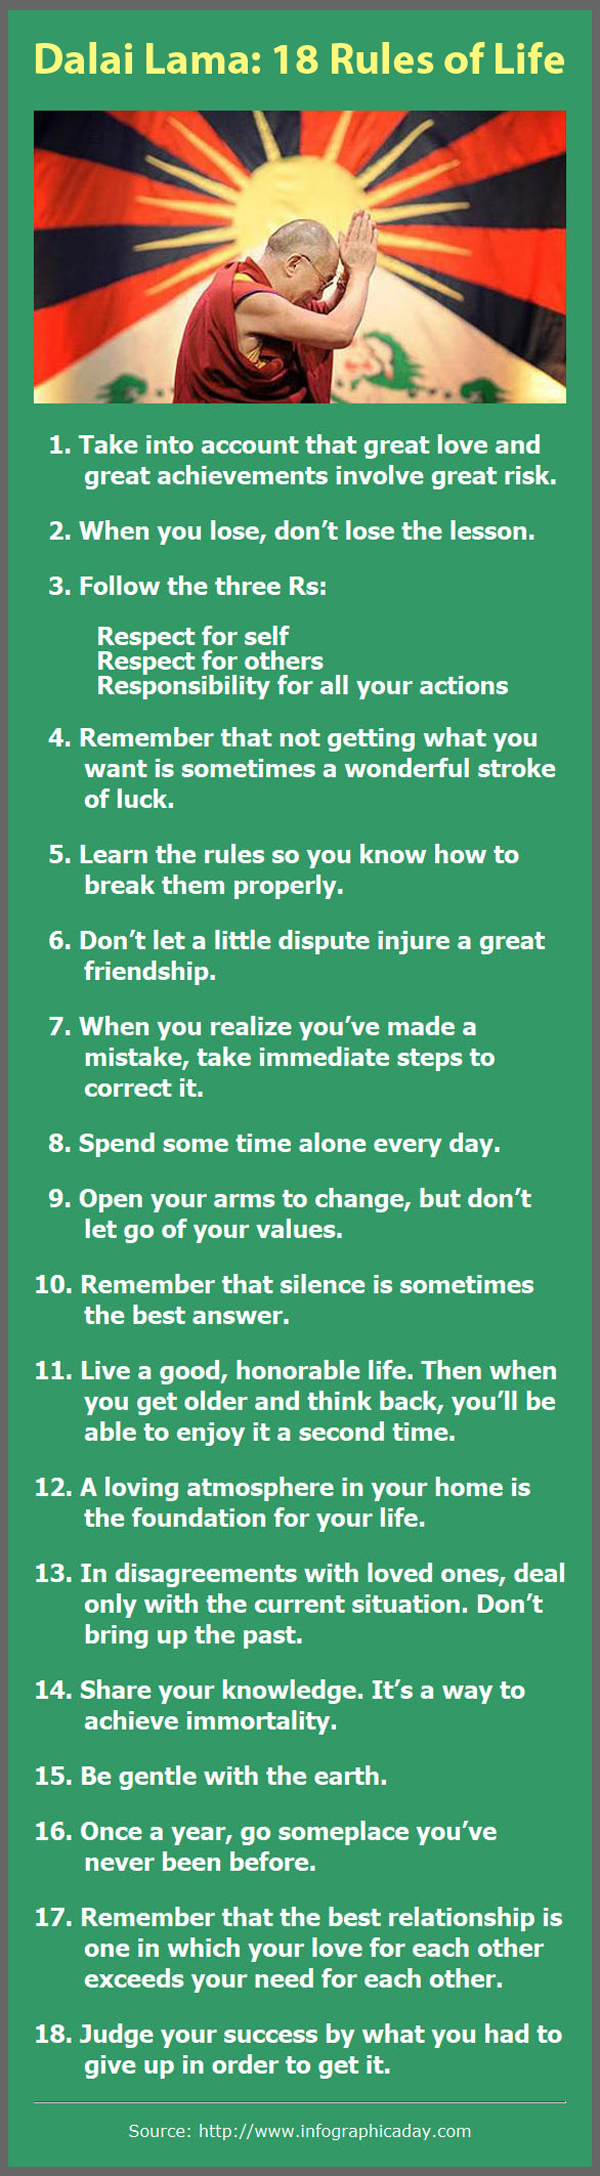 Eastern wisdom rules three things